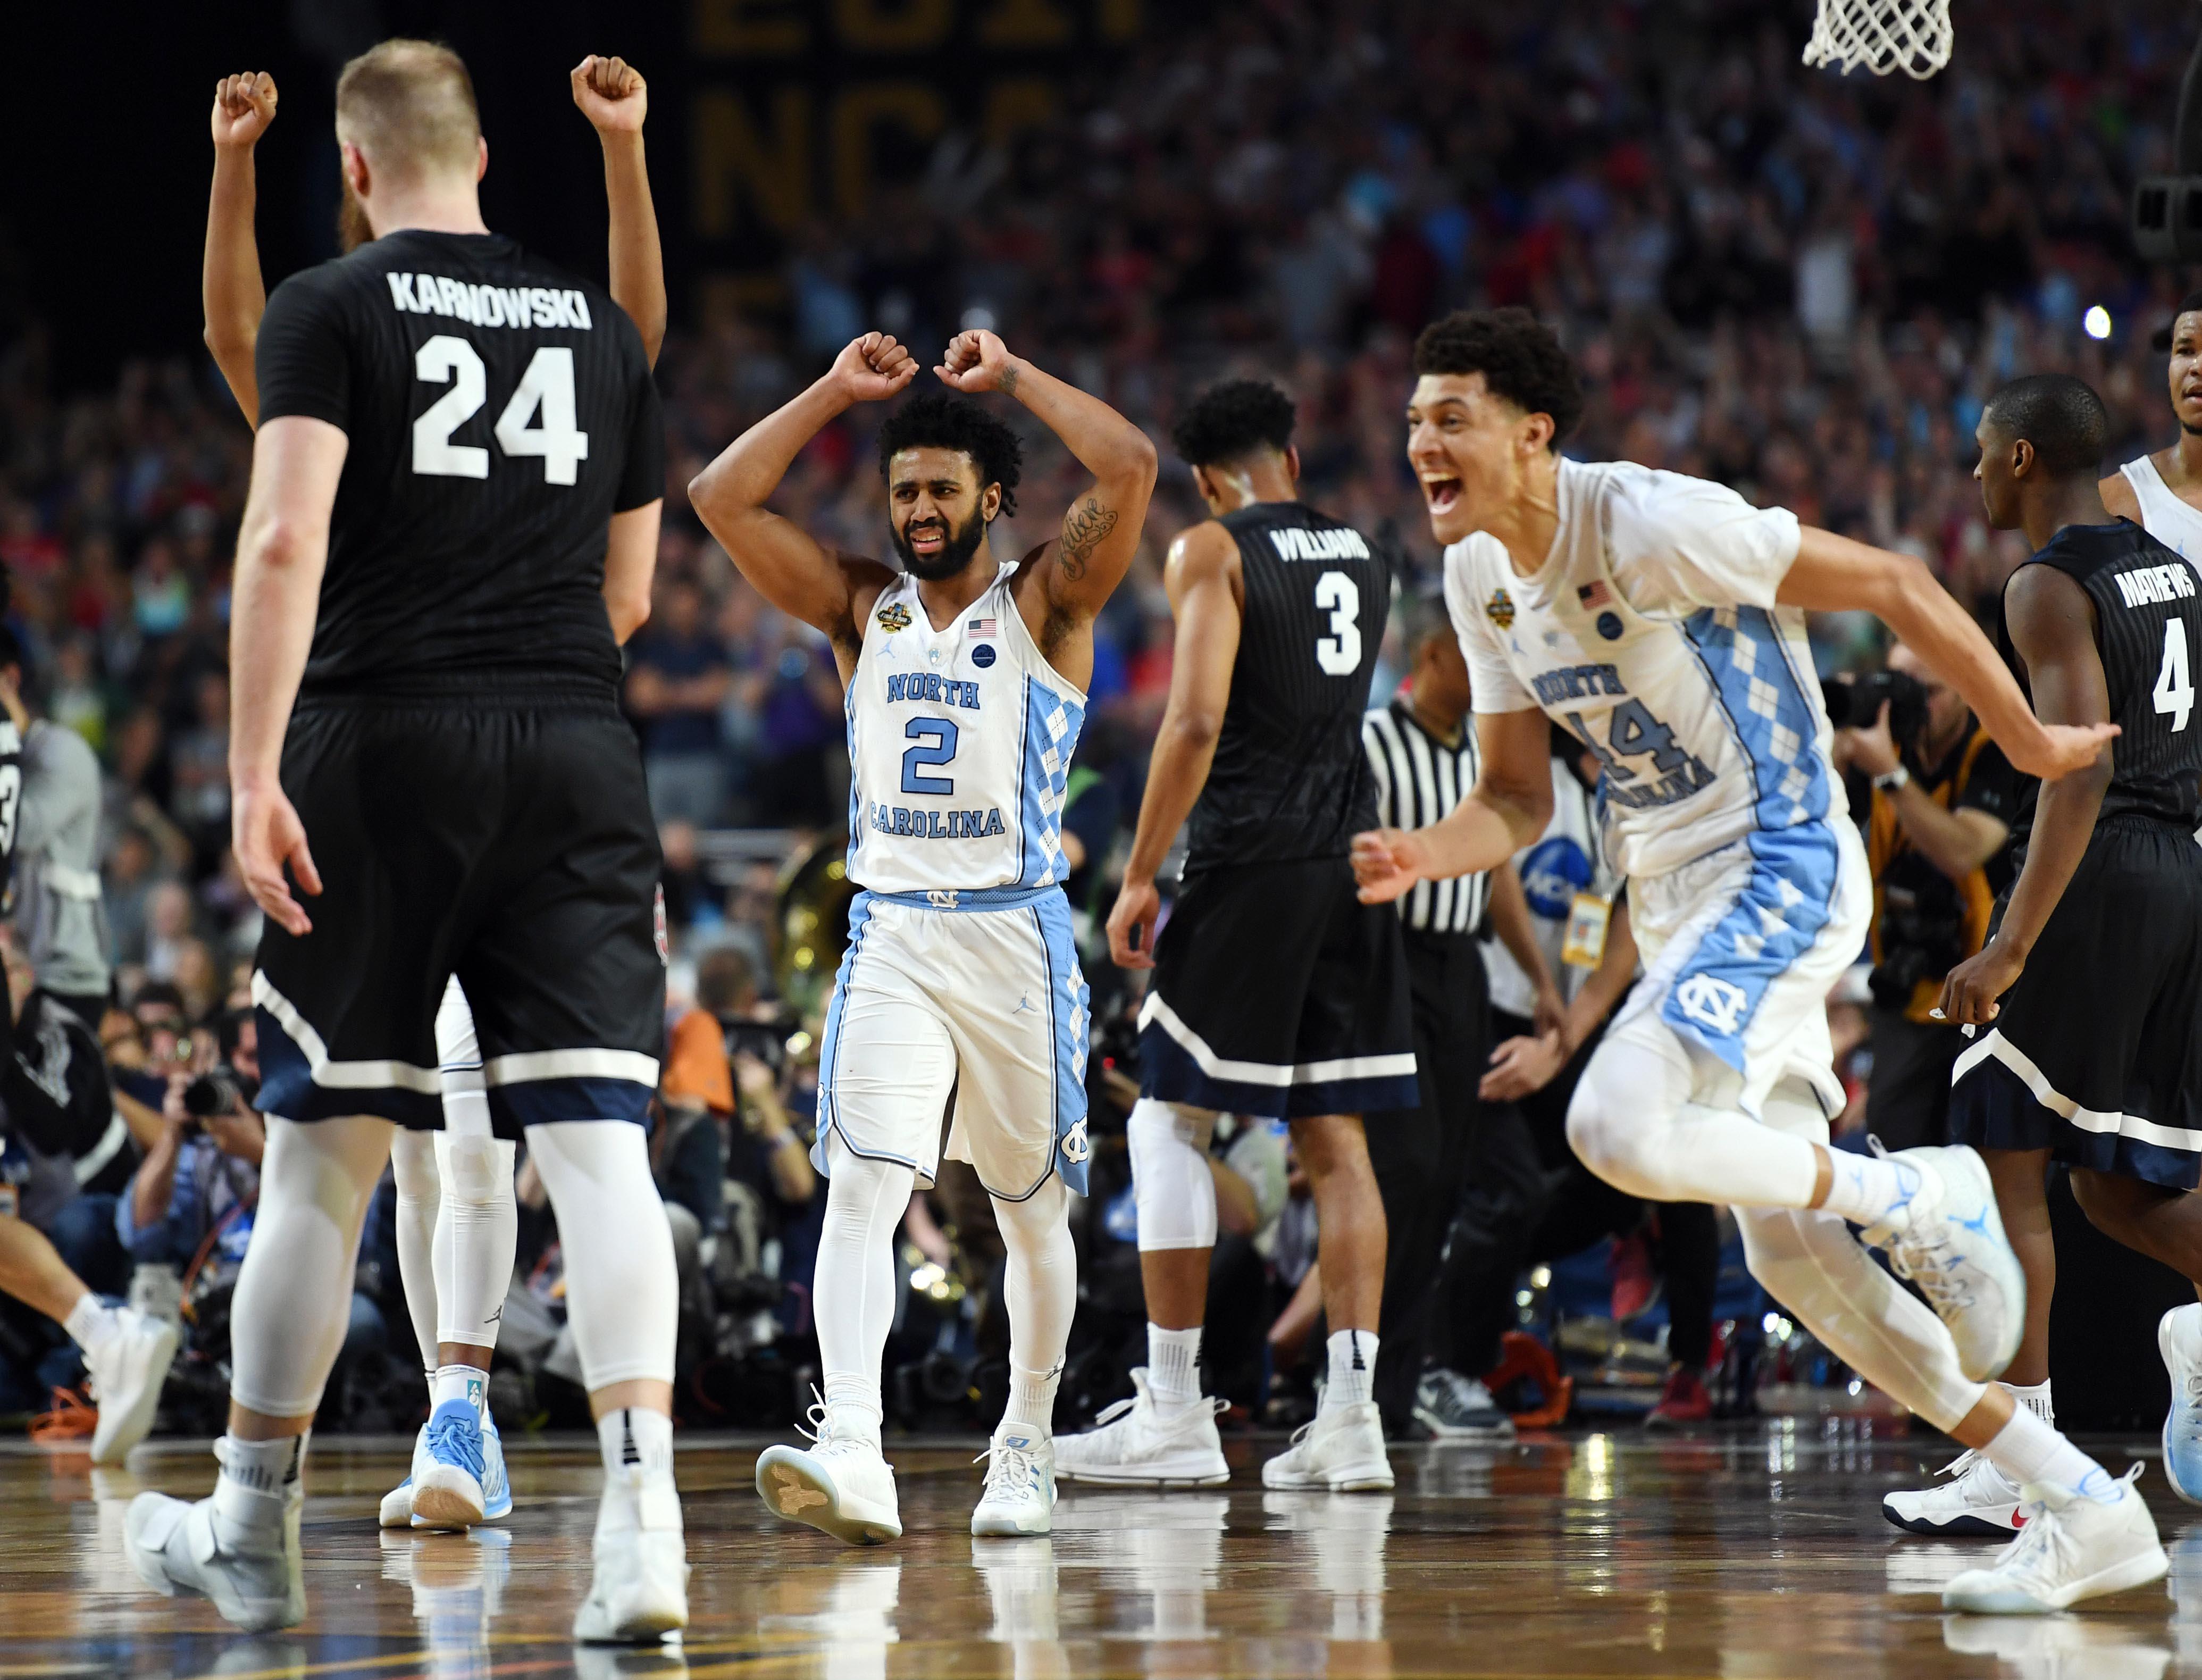 9992356-ncaa-basketball-final-four-championship-game-gonzaga-vs-north-carolina-1